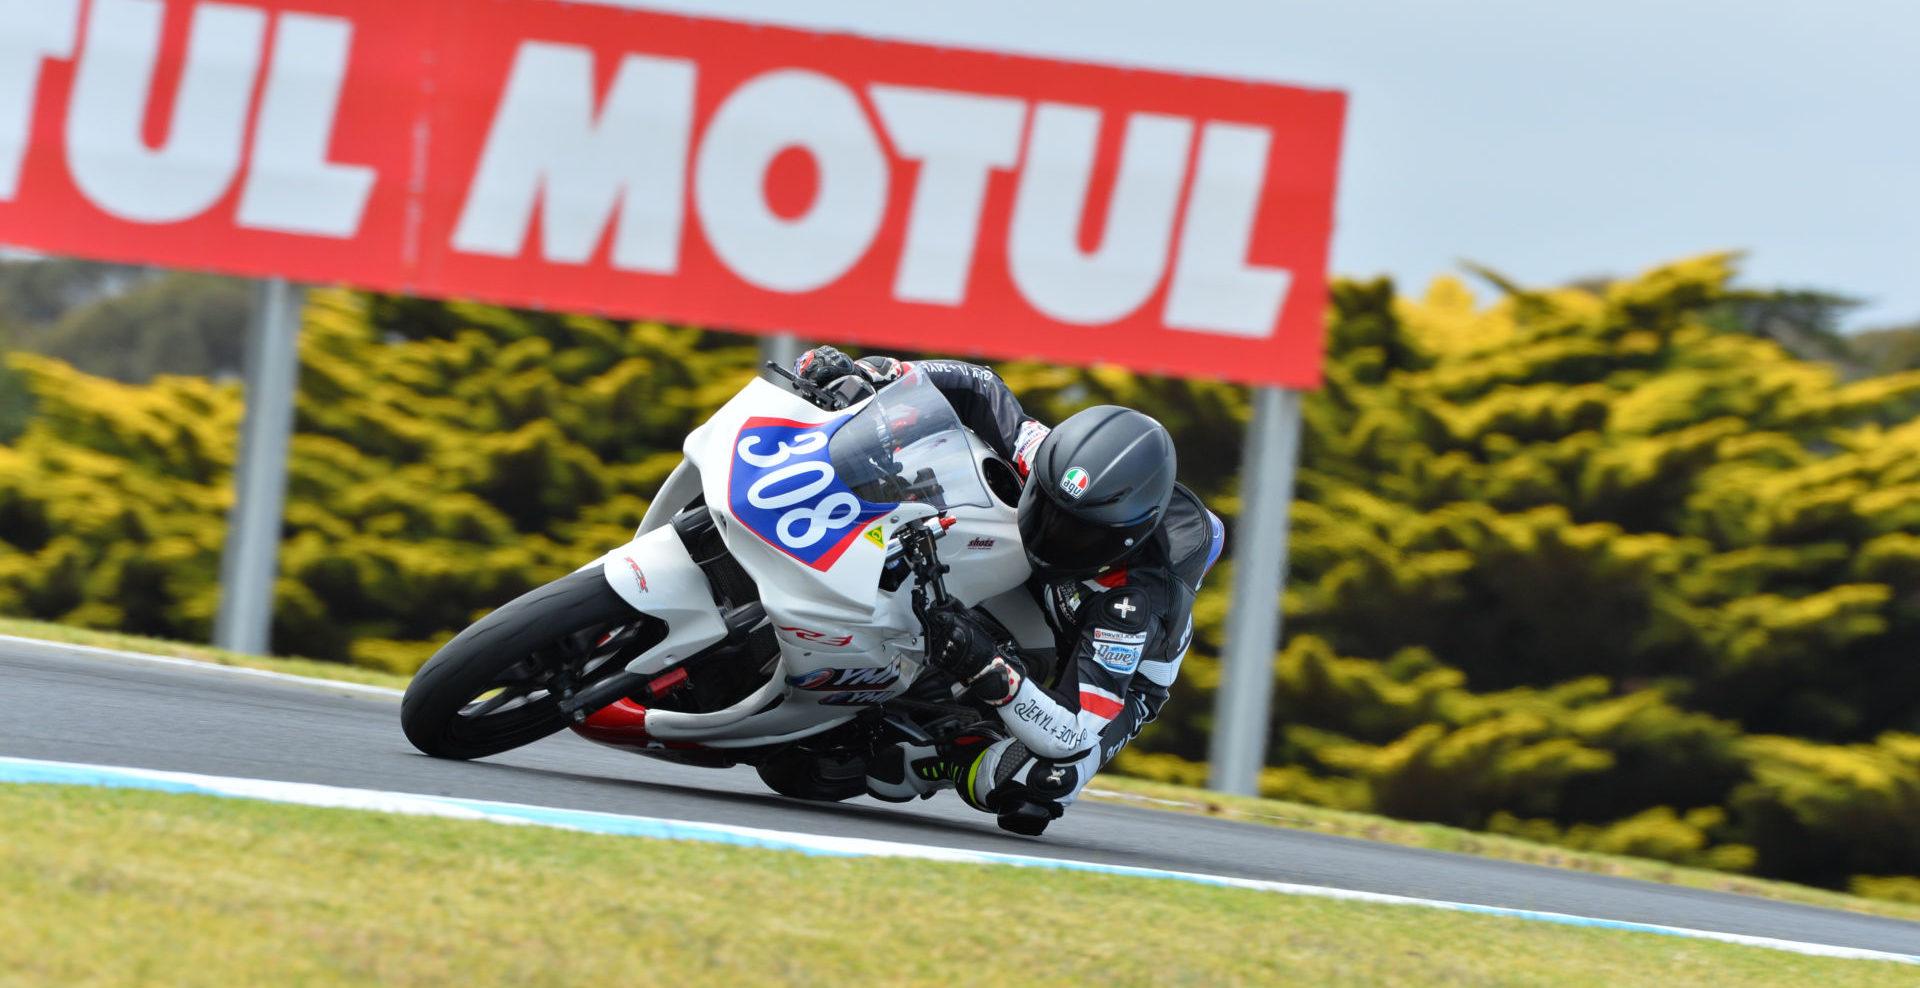 Motul is the presenting sponsor of the 2020 mi-bike Insurance Australian Superbike Championship. Photo courtesy of Motorcycling Australia.